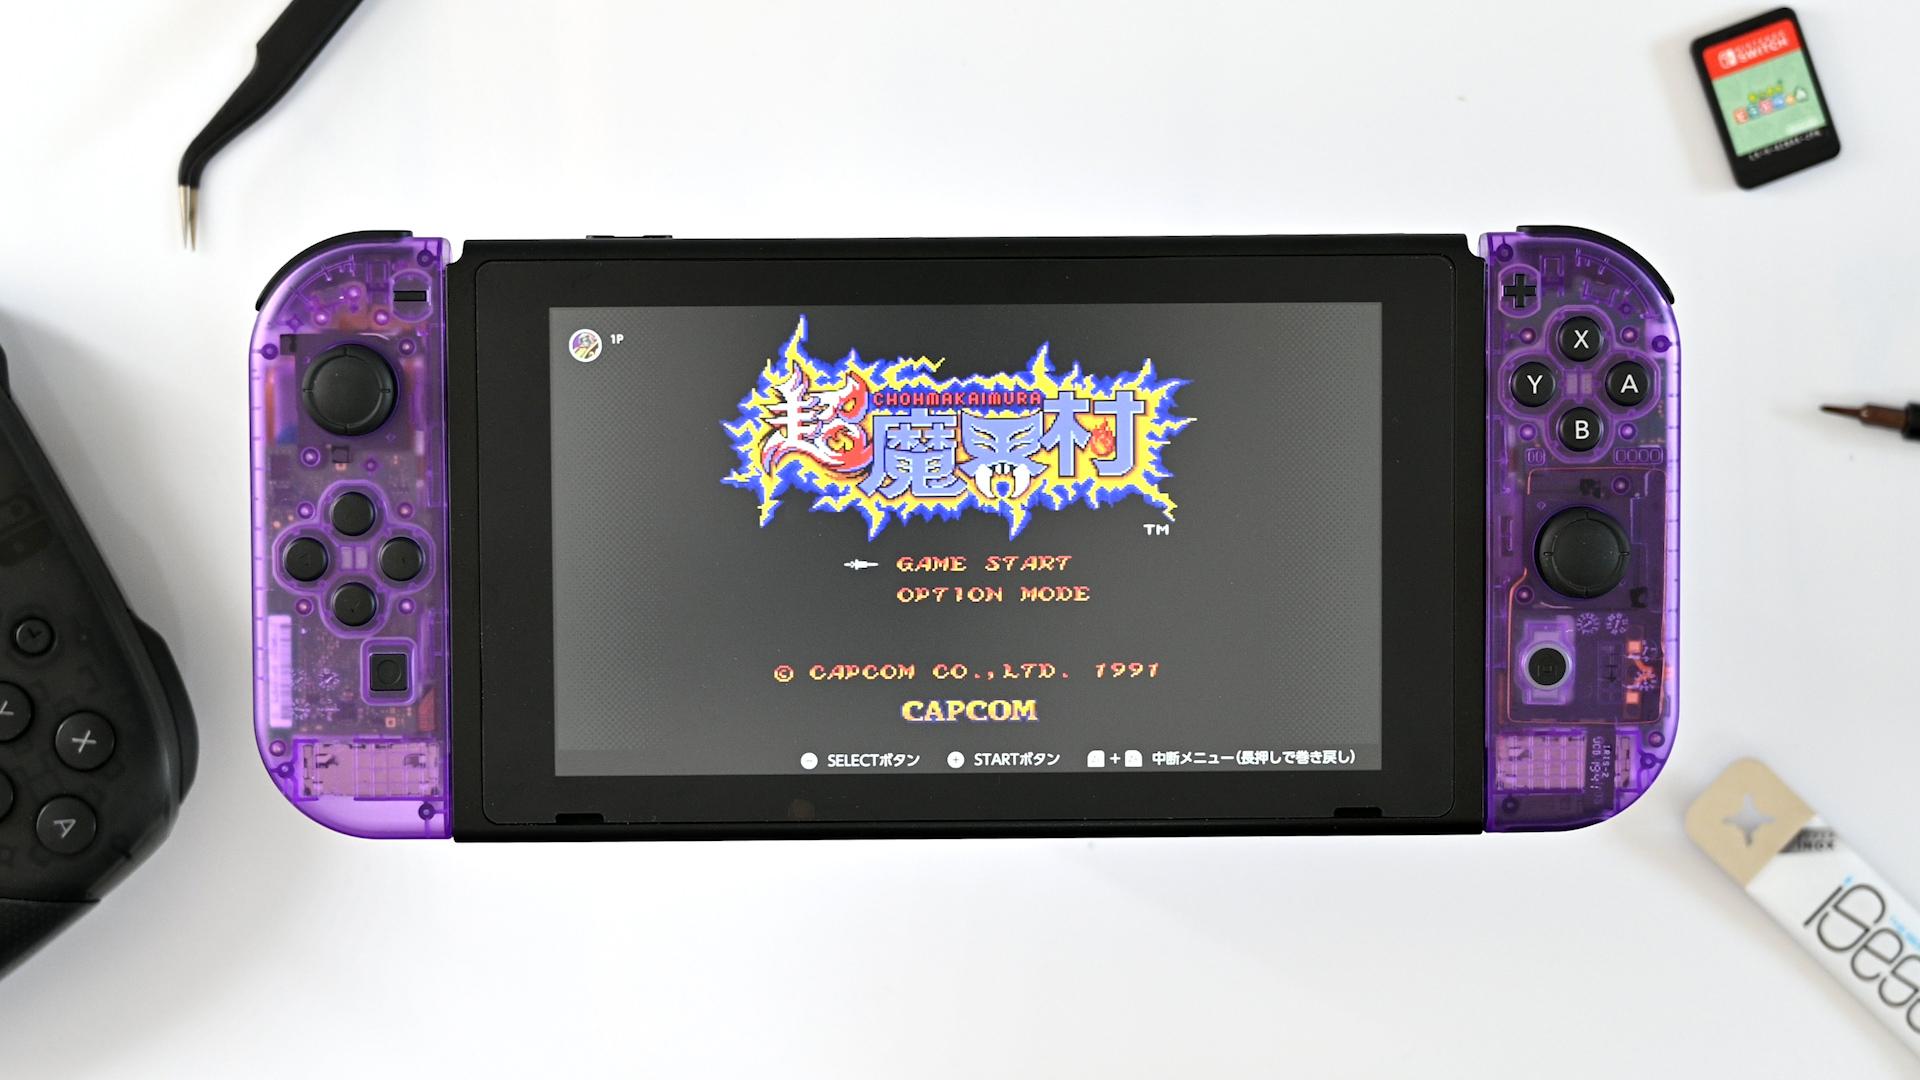 Nintendo SwitchとJoy-Conを分解して外装を交換する手順